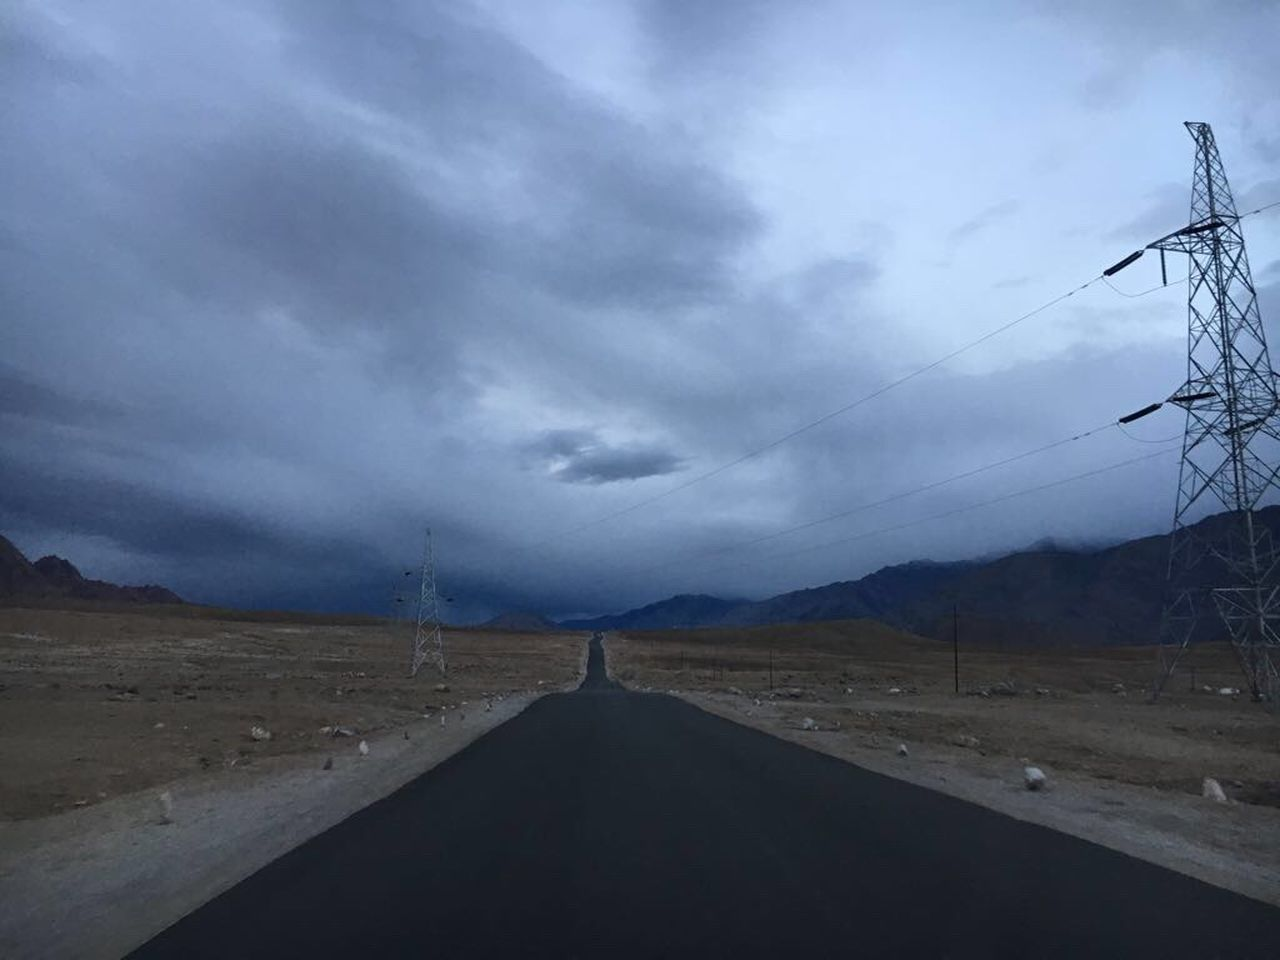 Longshot Highway Leh Ladakh Beautiful View Clouds India Tour Alone